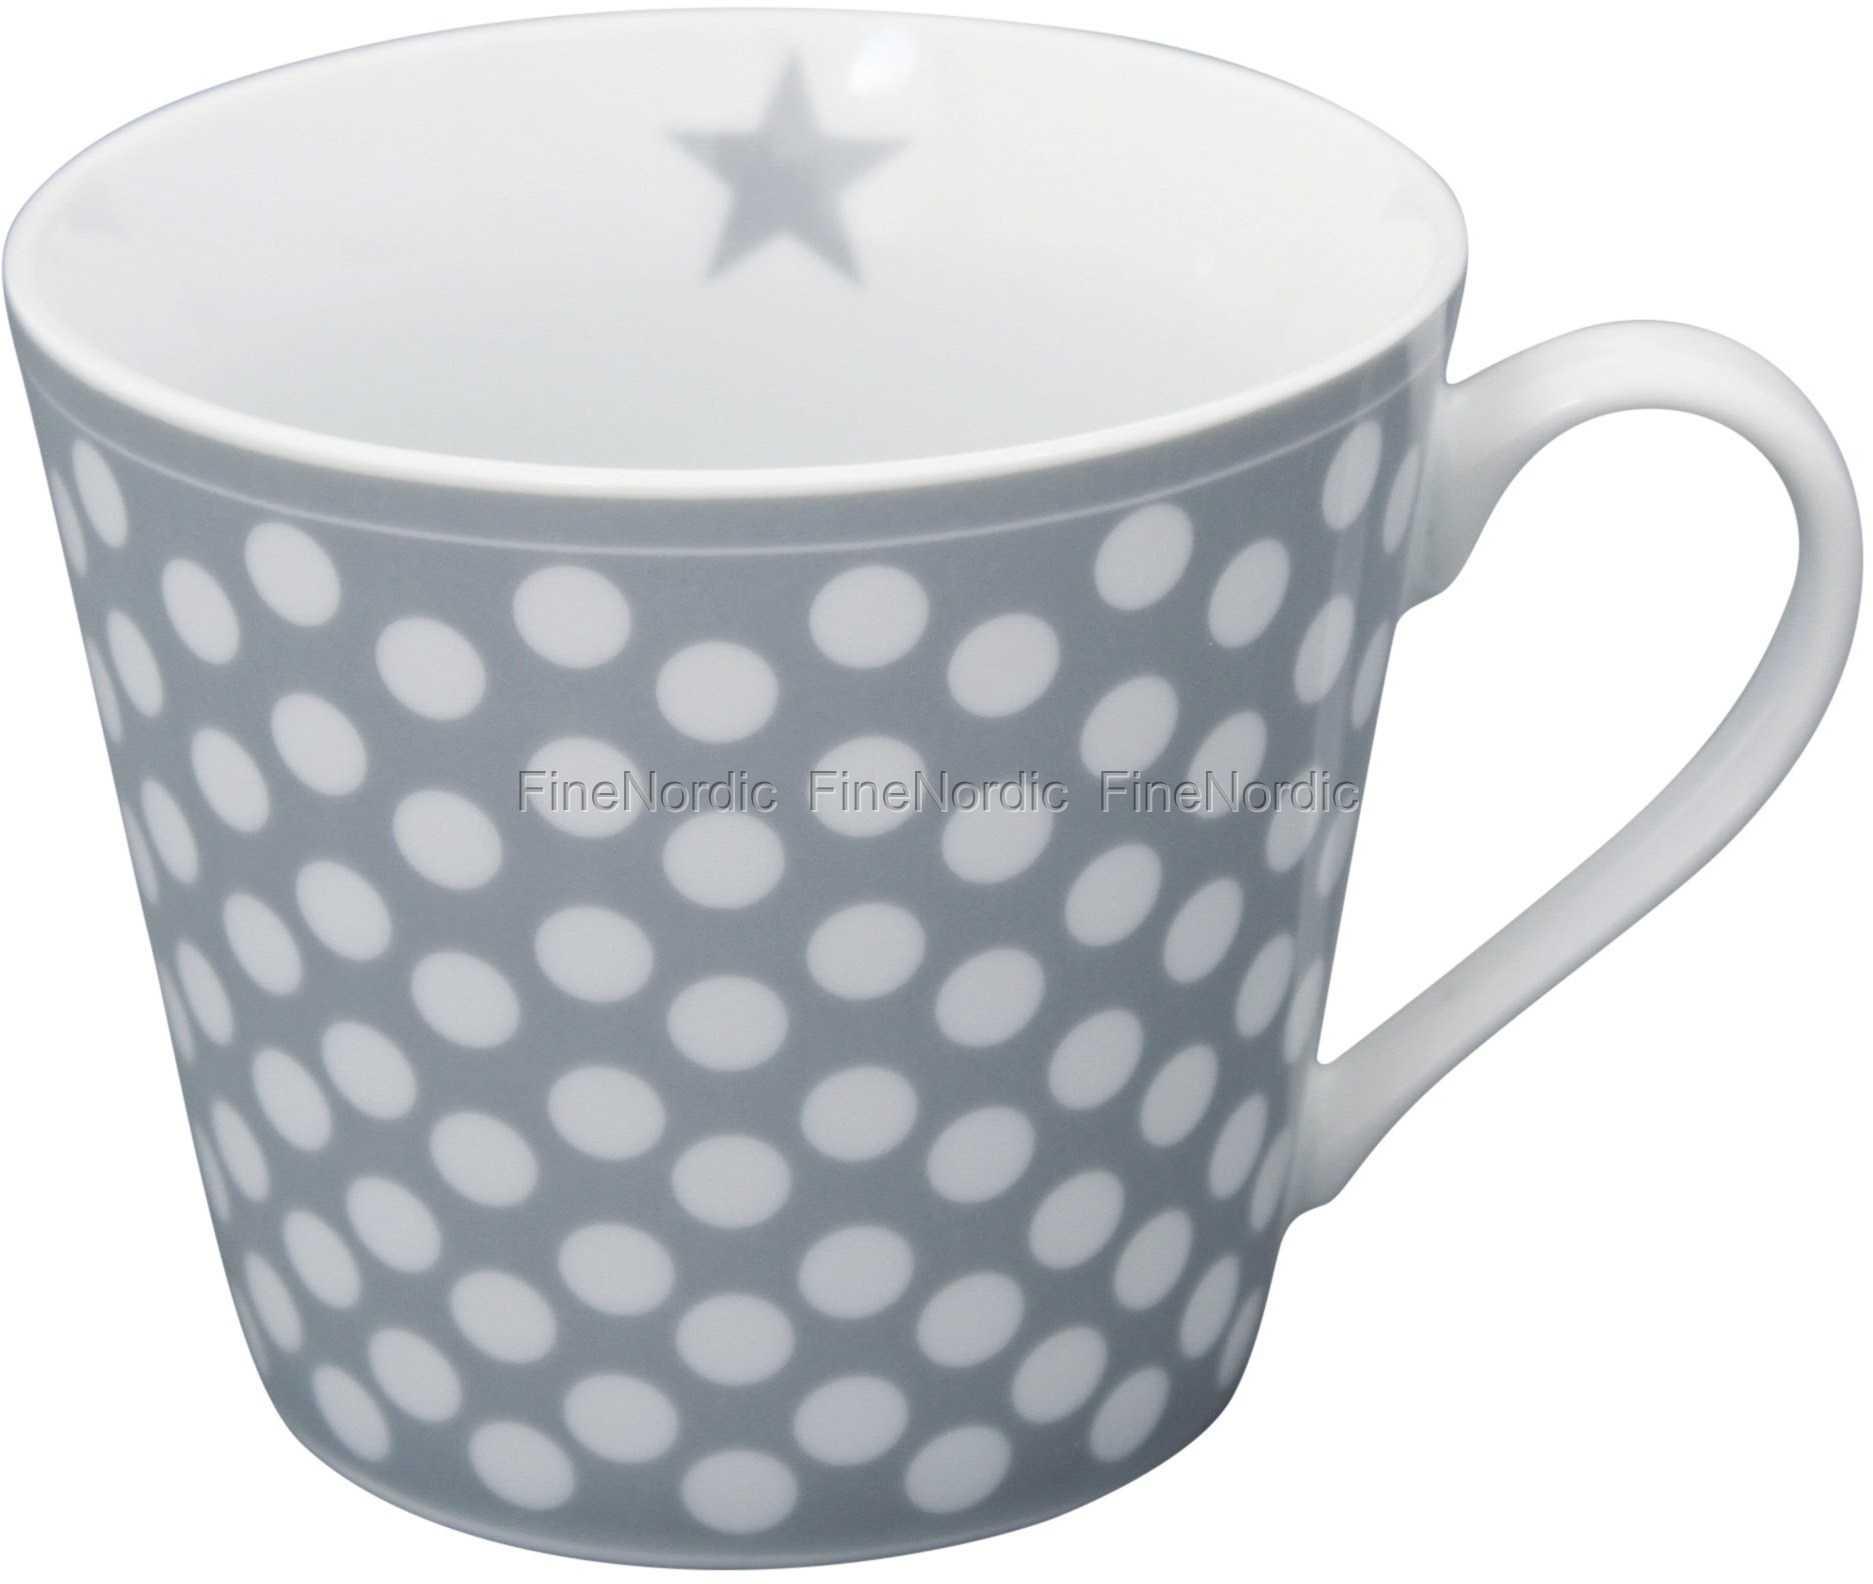 Krasilnikoff Happy Mug Mug Dots Light Grey White Cup Porcelain Grey